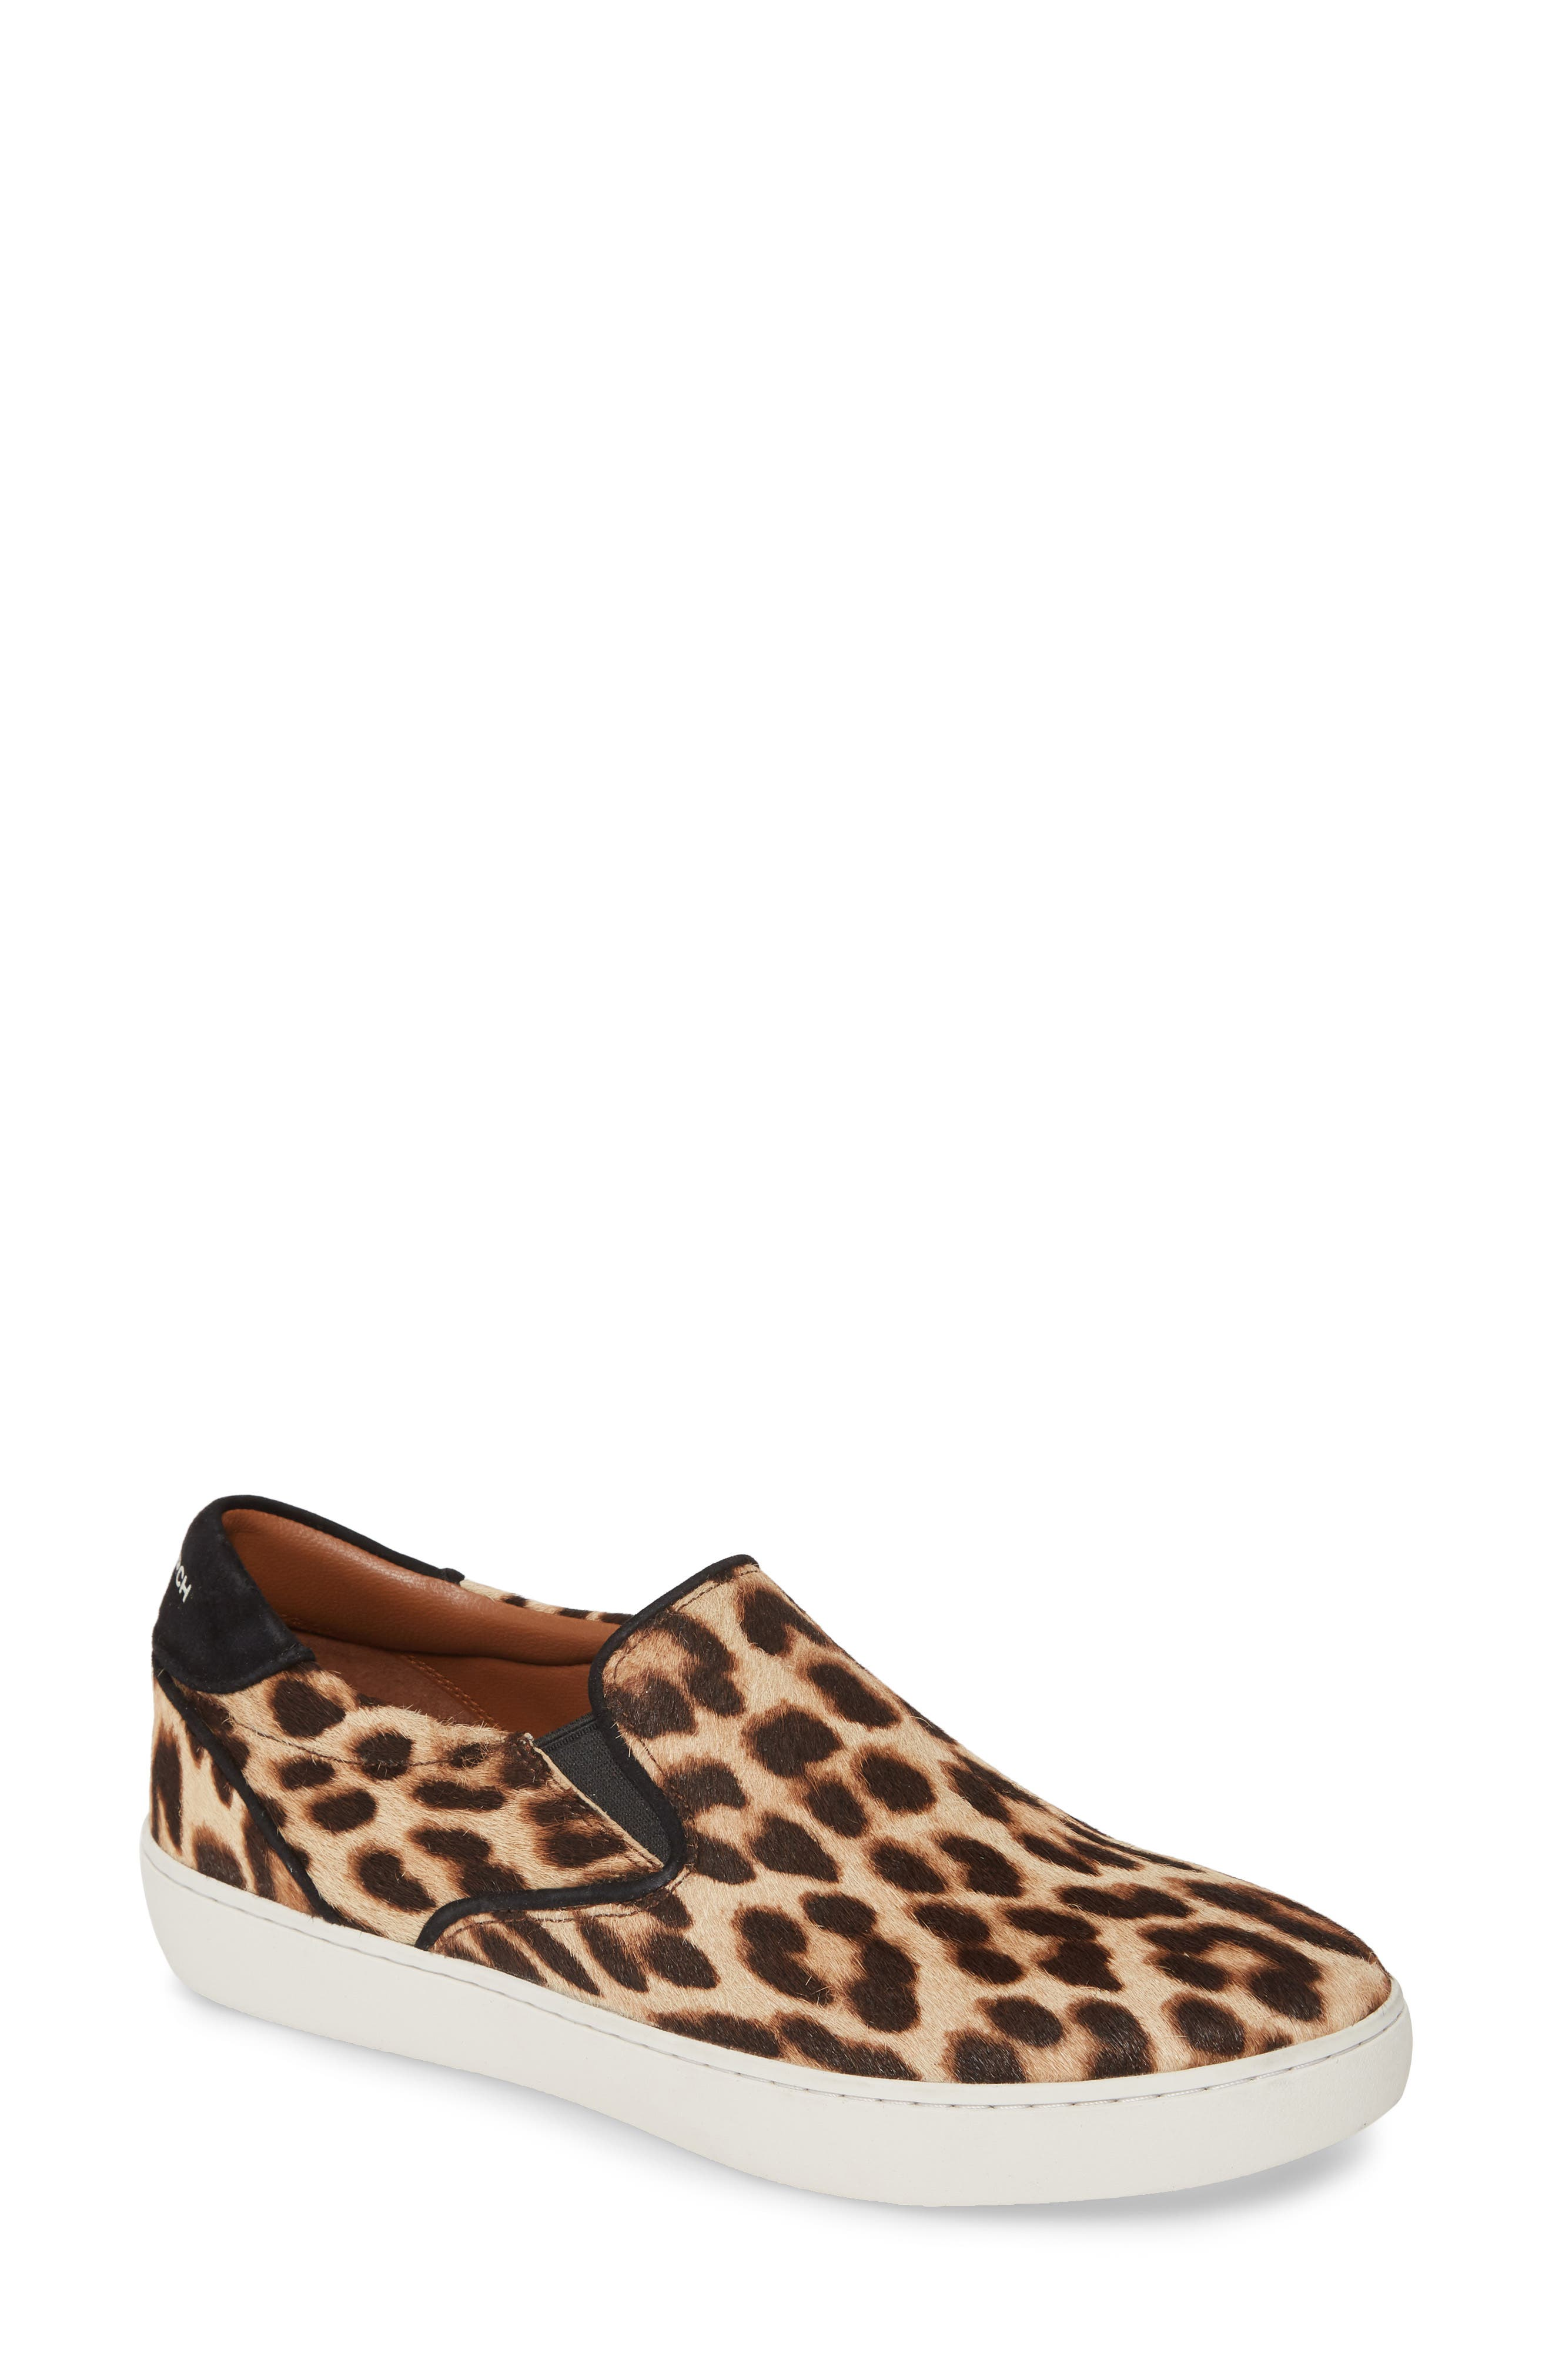 Tory Burch Sneakers Genuine Calf Hair Sneaker